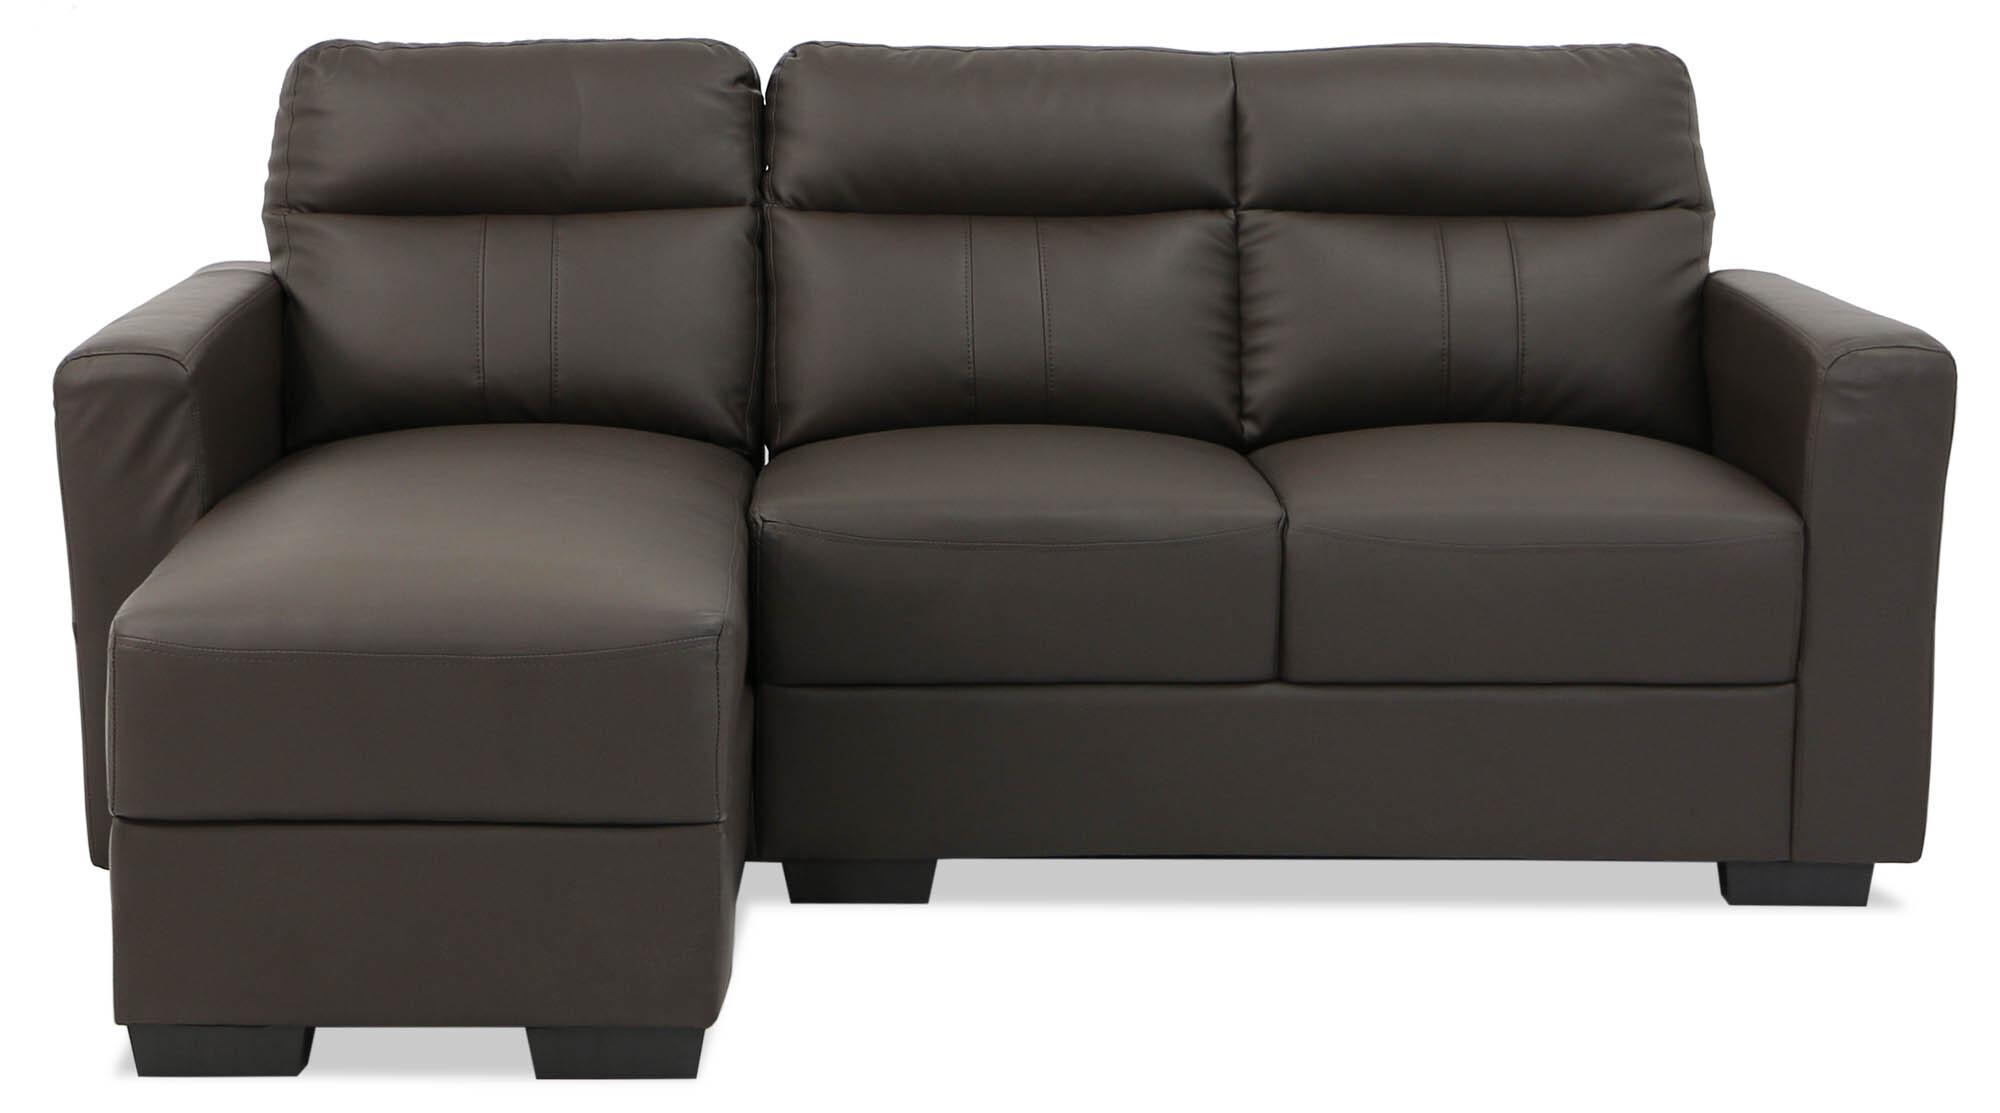 Mon 2 Seater L Shape Sofa